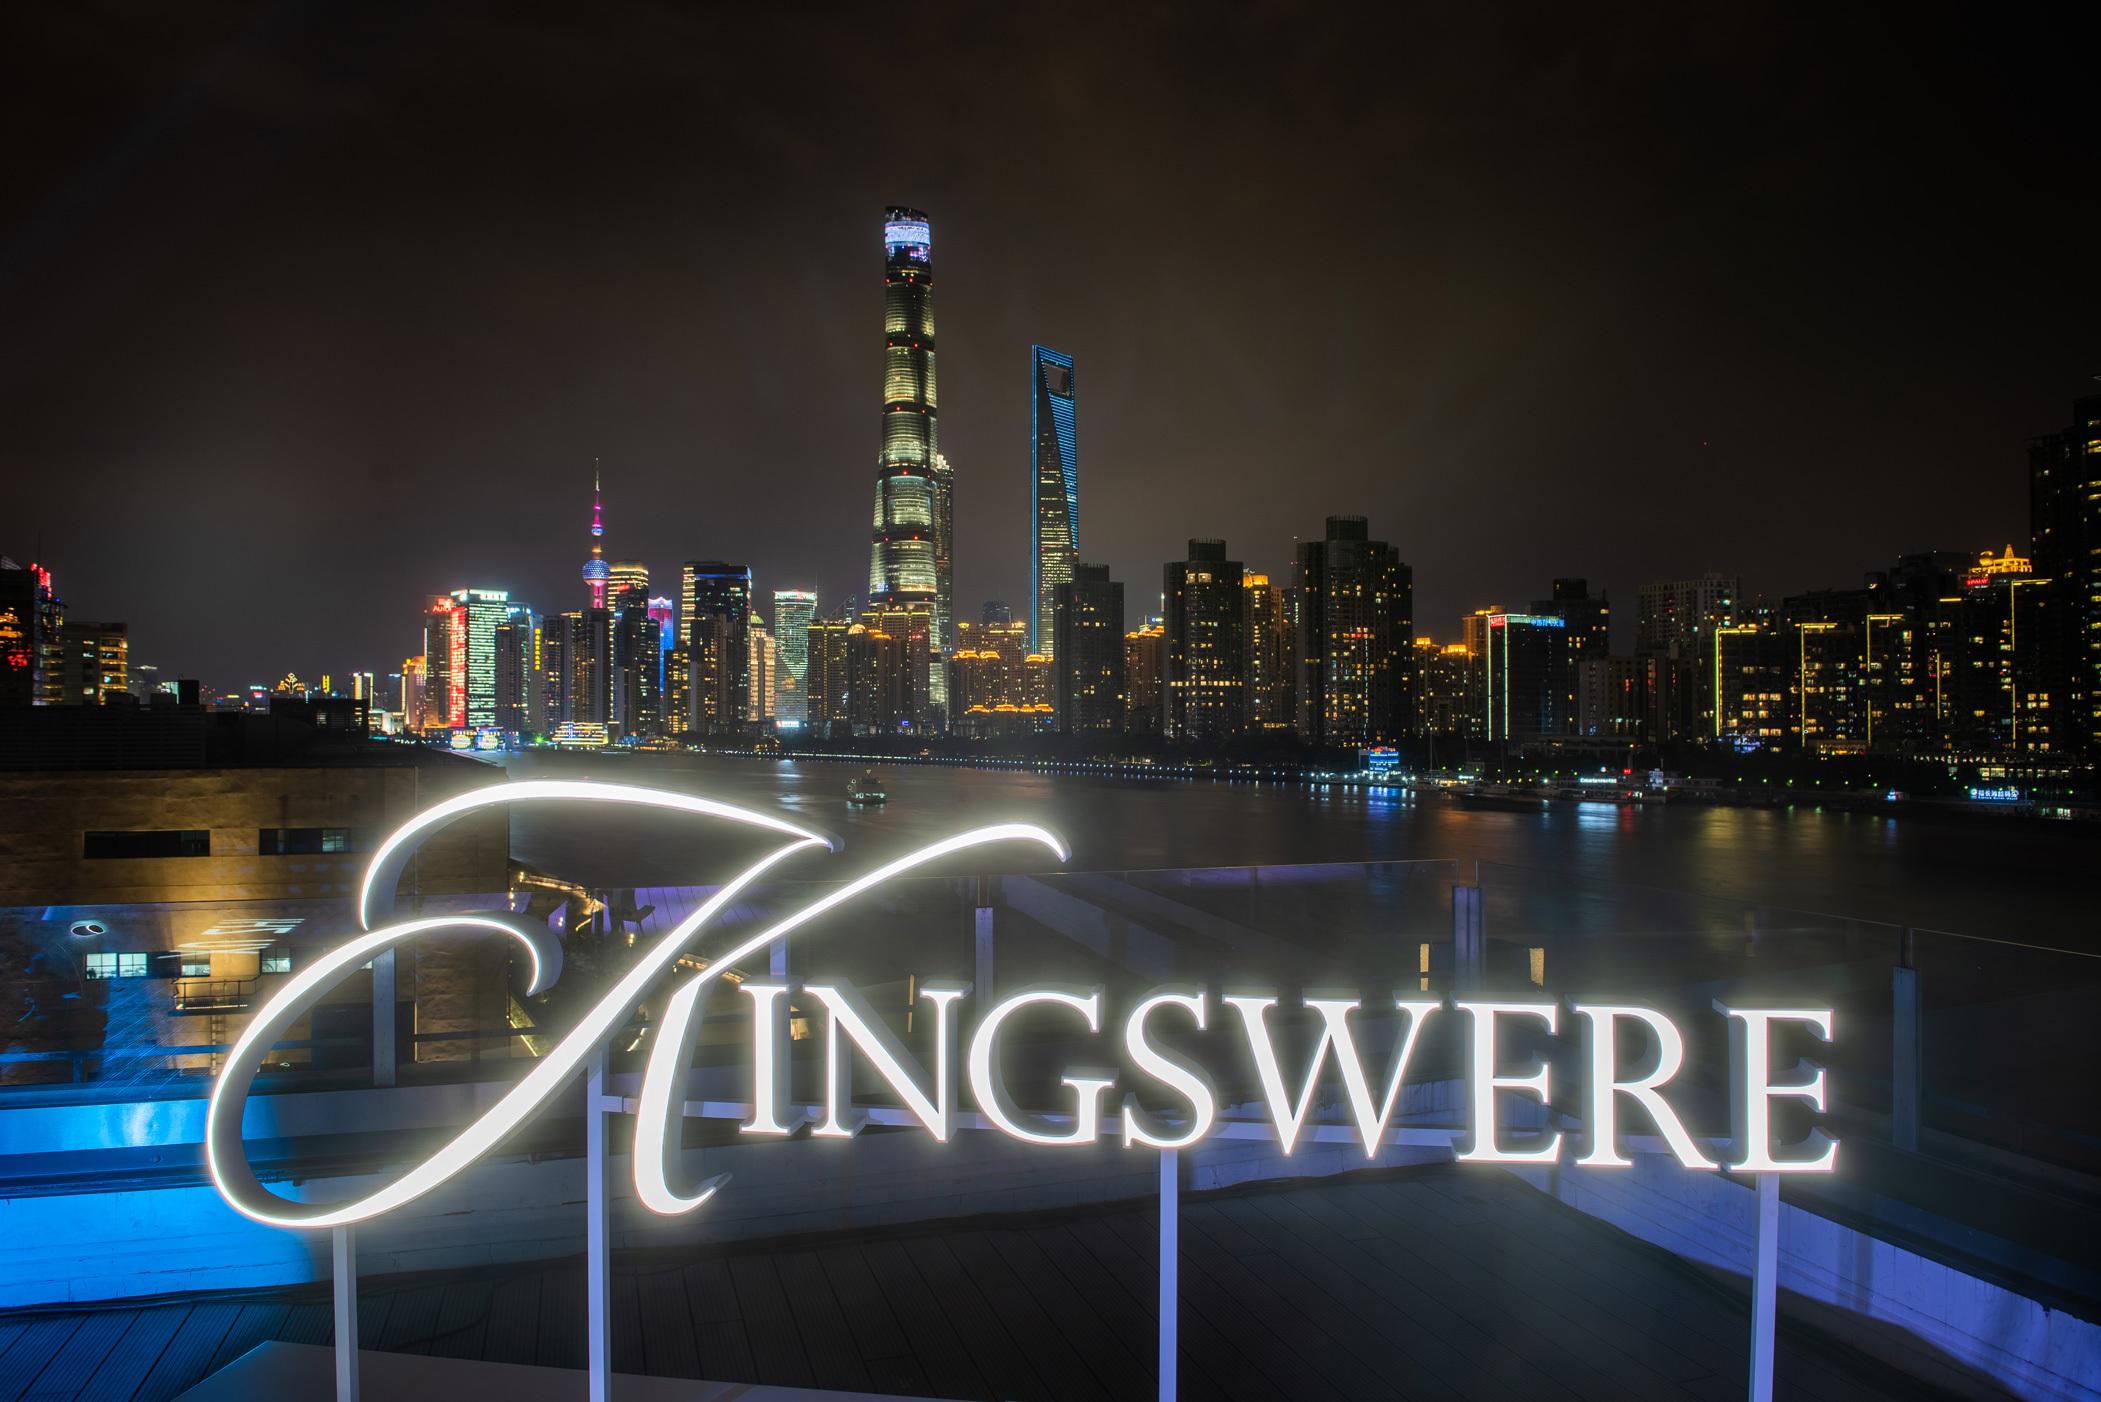 KINGSWERE跨界时尚,与新锐设计师陈序之演